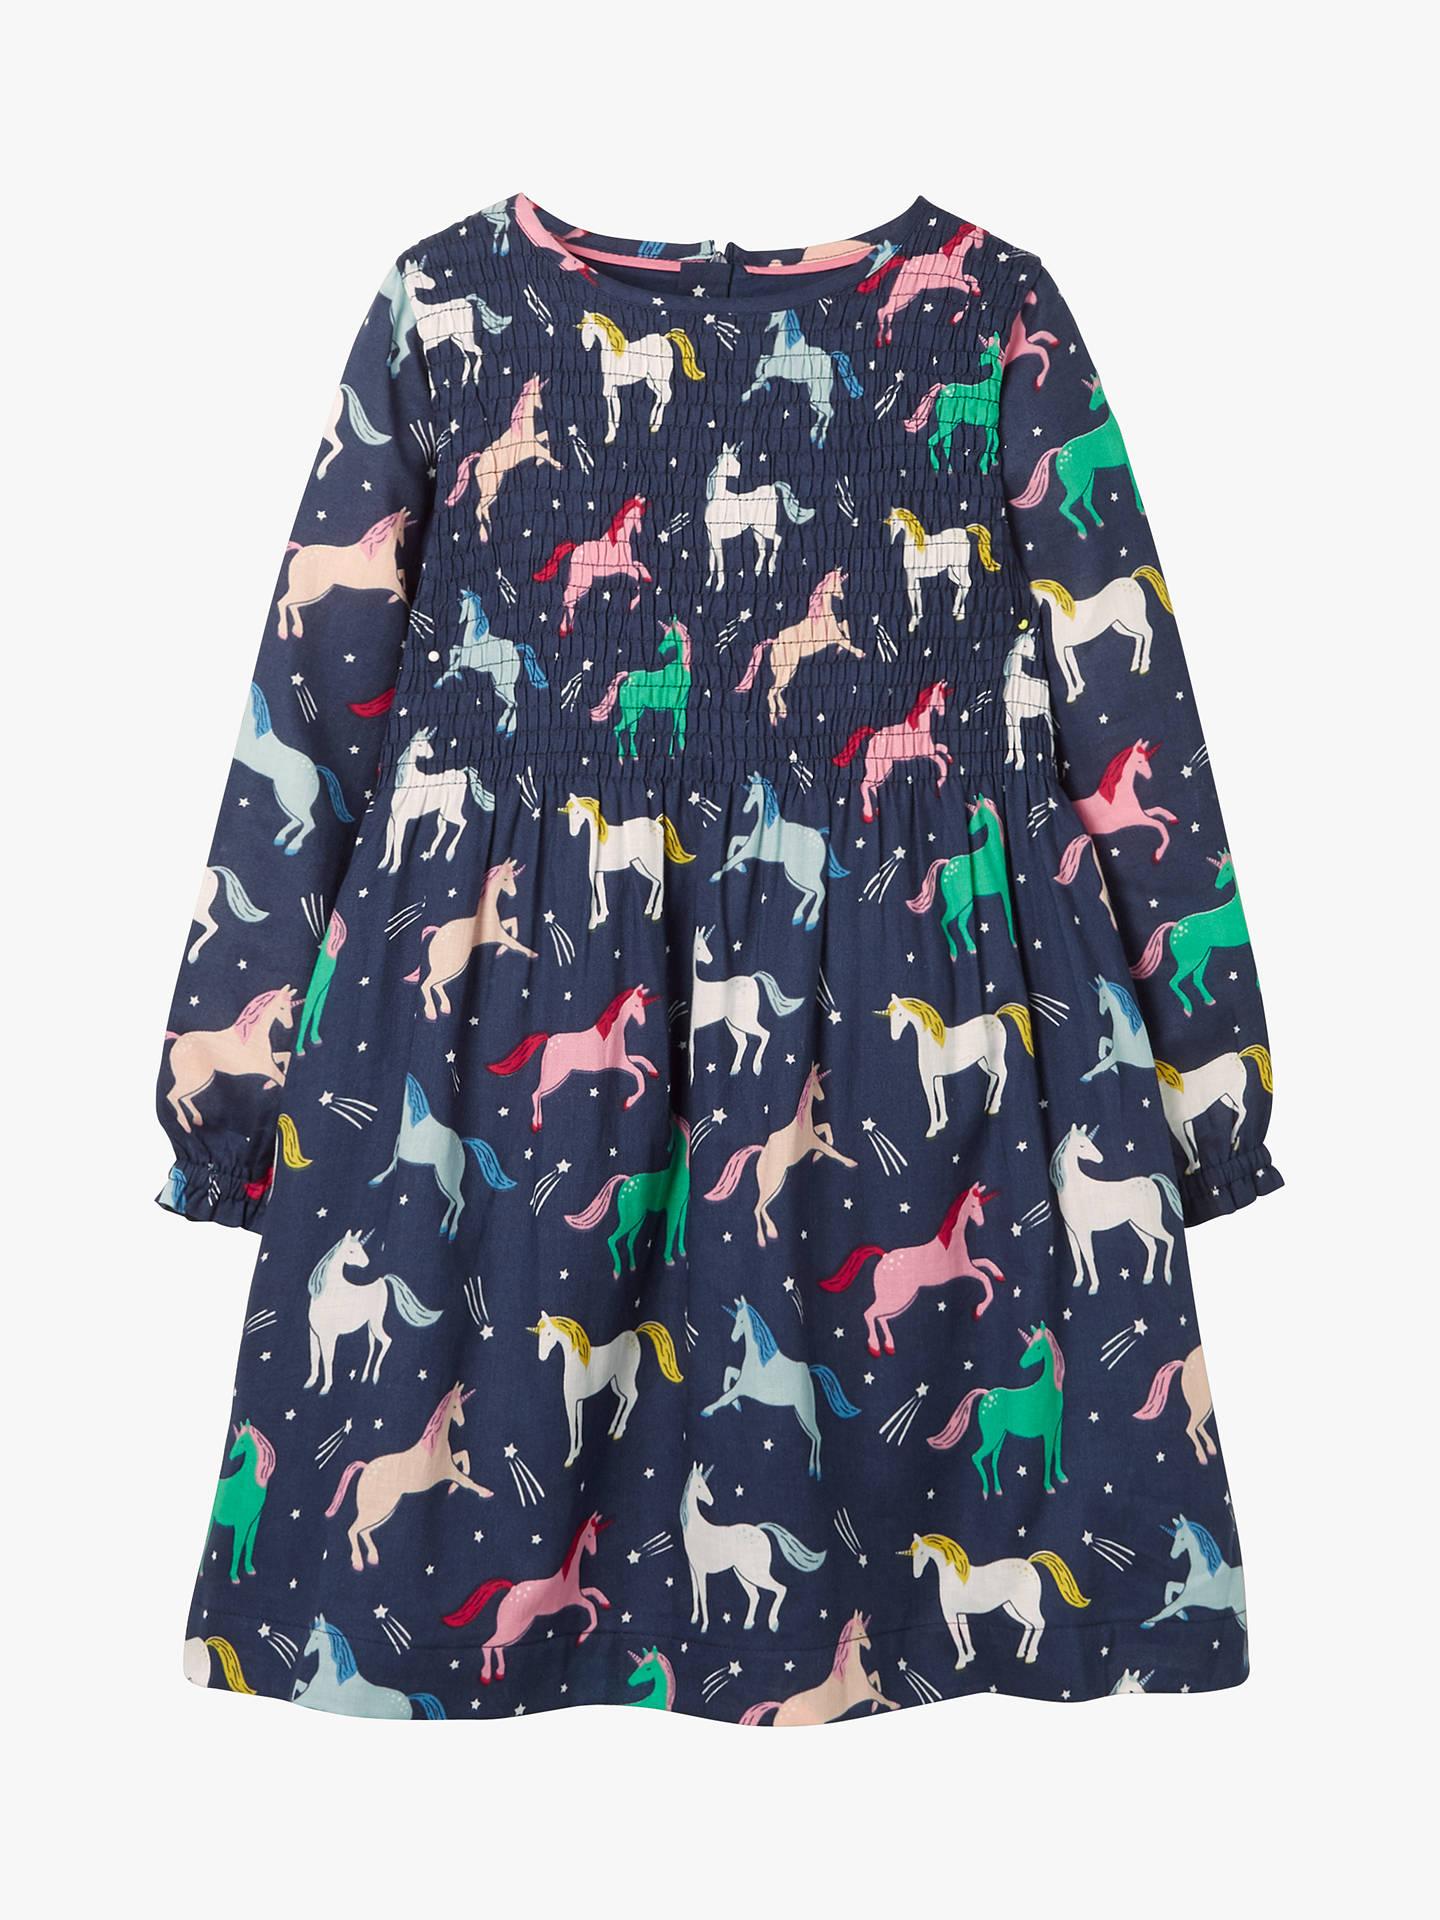 Mini Boden Girls' Unicorn Printed Smock Dress, Navy at John